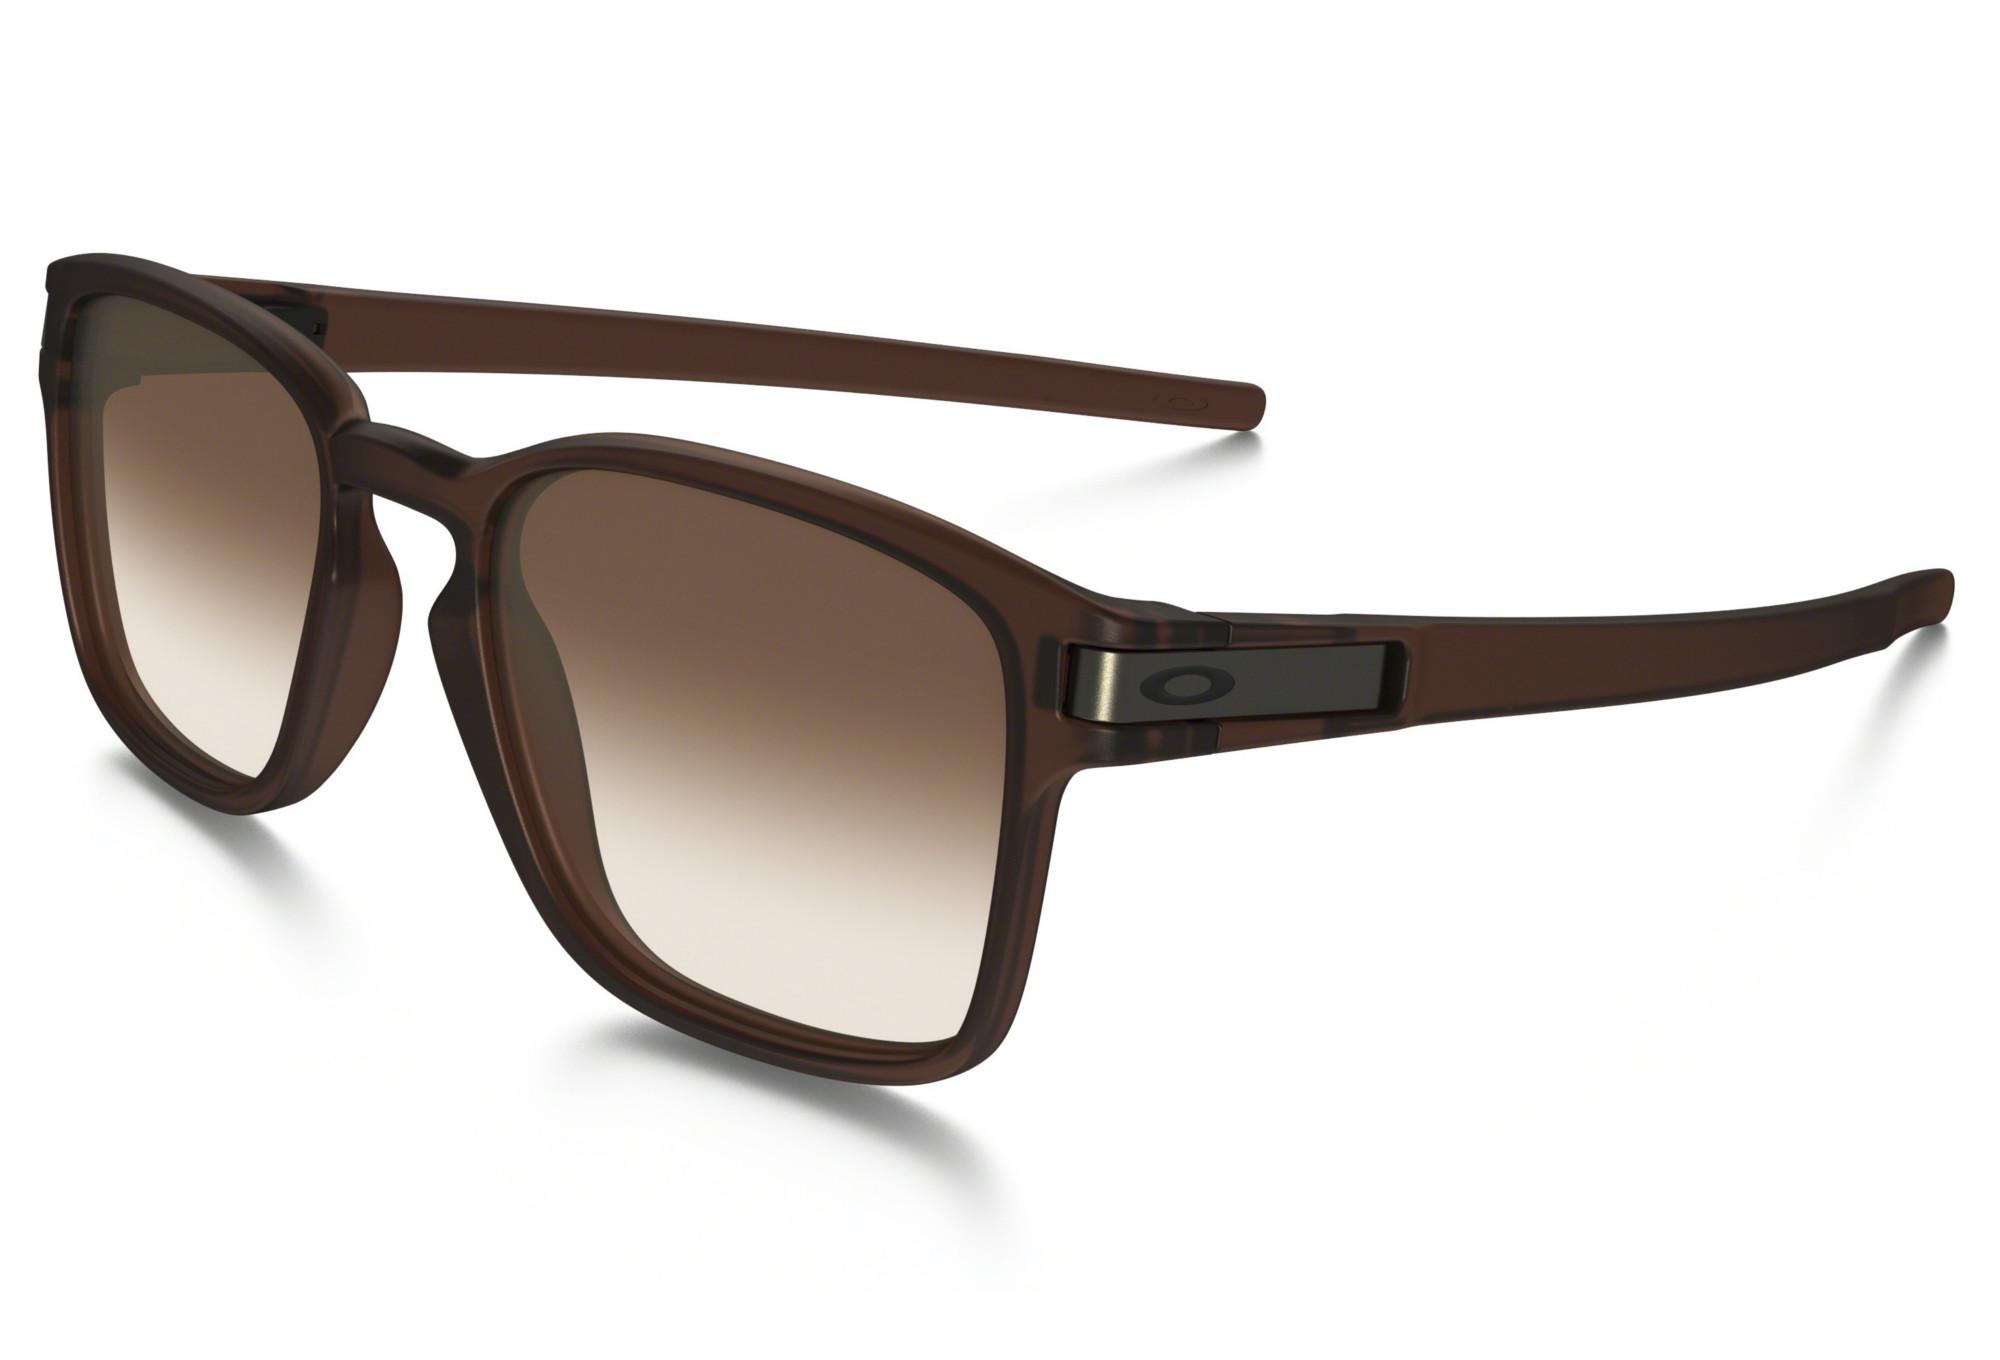 8eecaea111 OAKLEY LATCH SQ Sunglasses Brown - Brown Ref OO9353-09   Alltricks.com